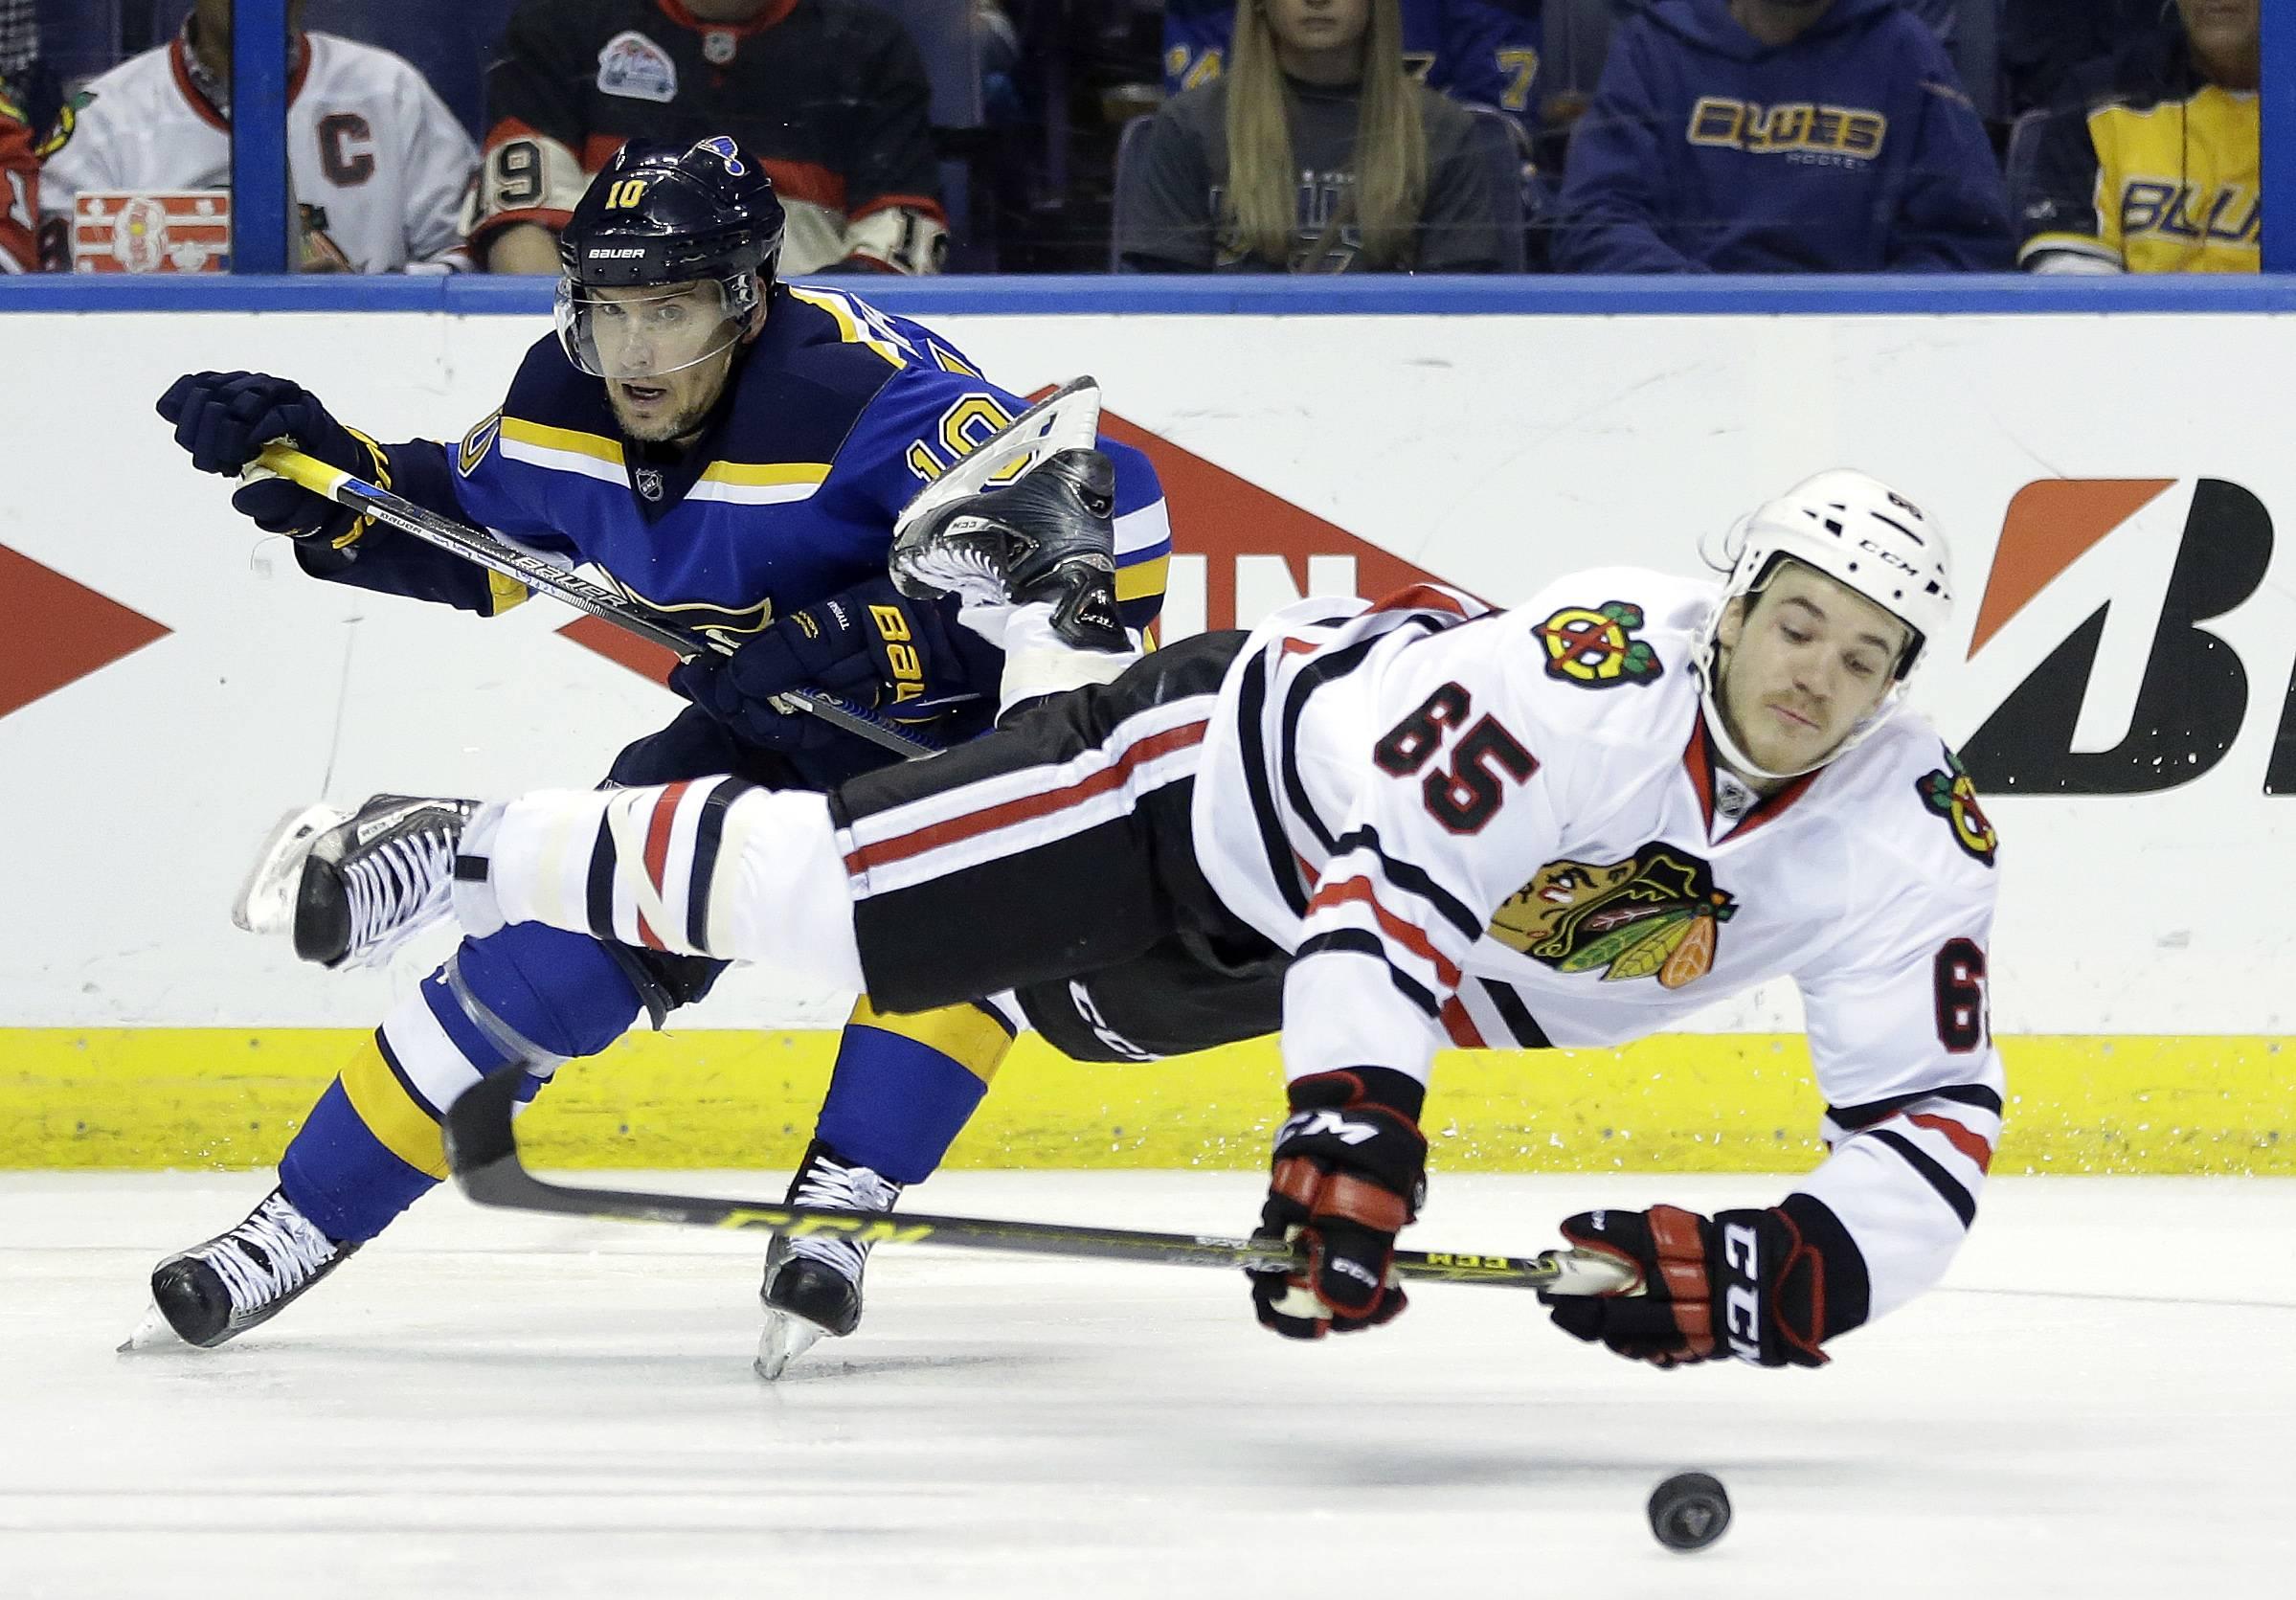 Chicago Blackhawks trade Shaw to Canadiens